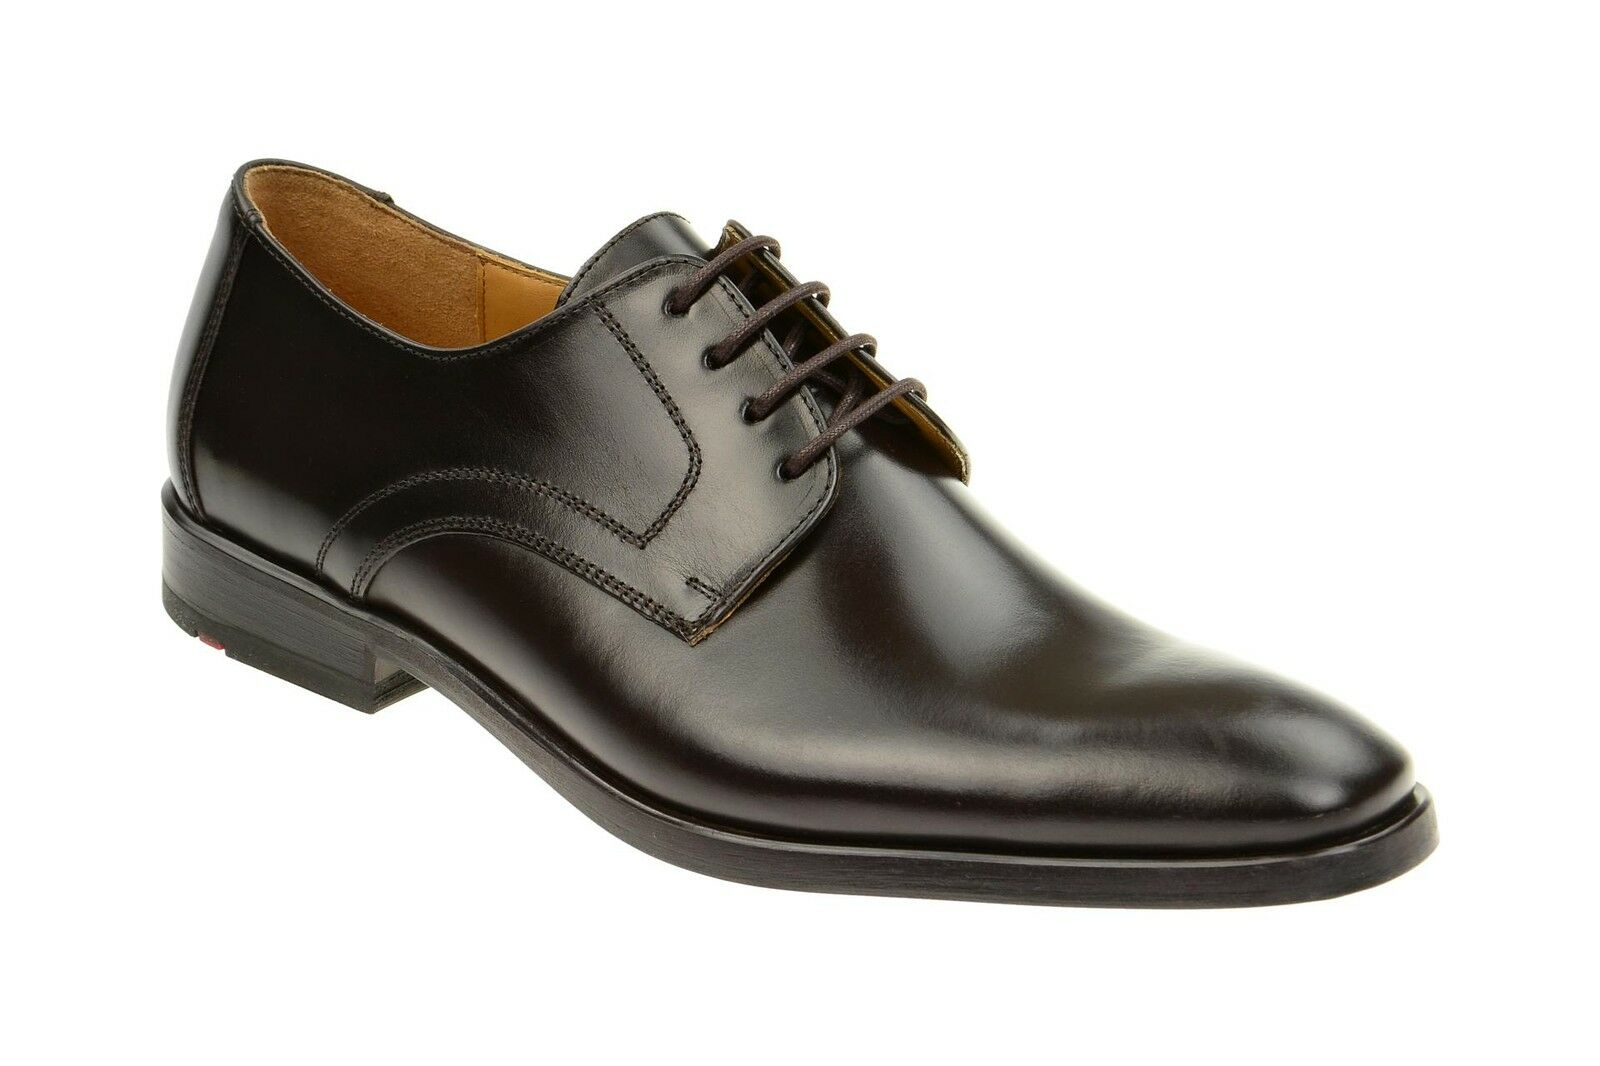 LLOYD Schuhe DANVILLE braun Herrenschuhe elegante Halbschuhe 14-062-07 NEU